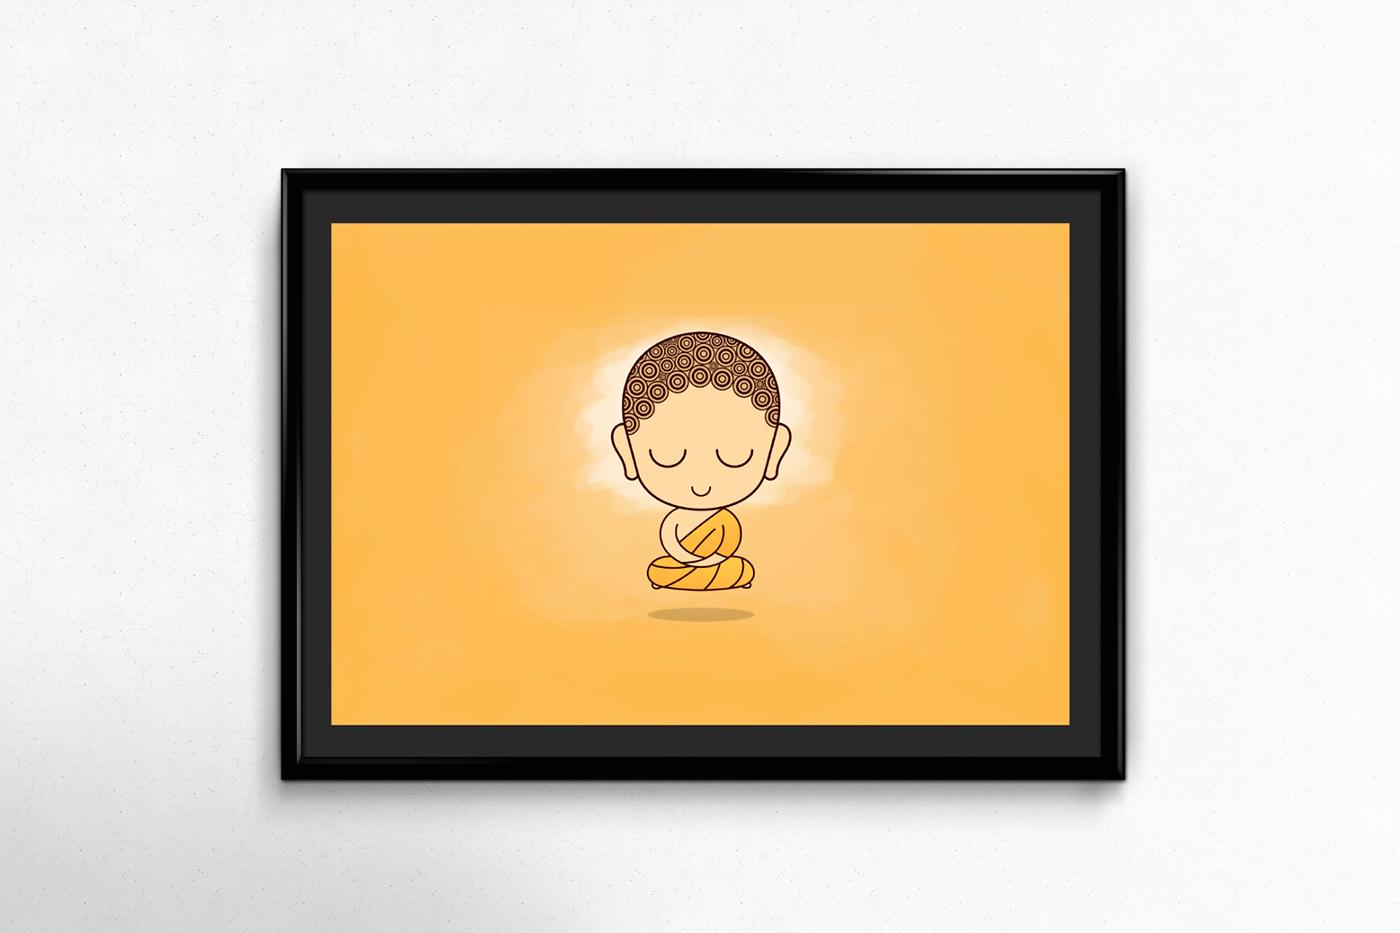 flat,art,Buddha,caricature  ,cartoon,cute,poster,buddhism,Icon,sticker